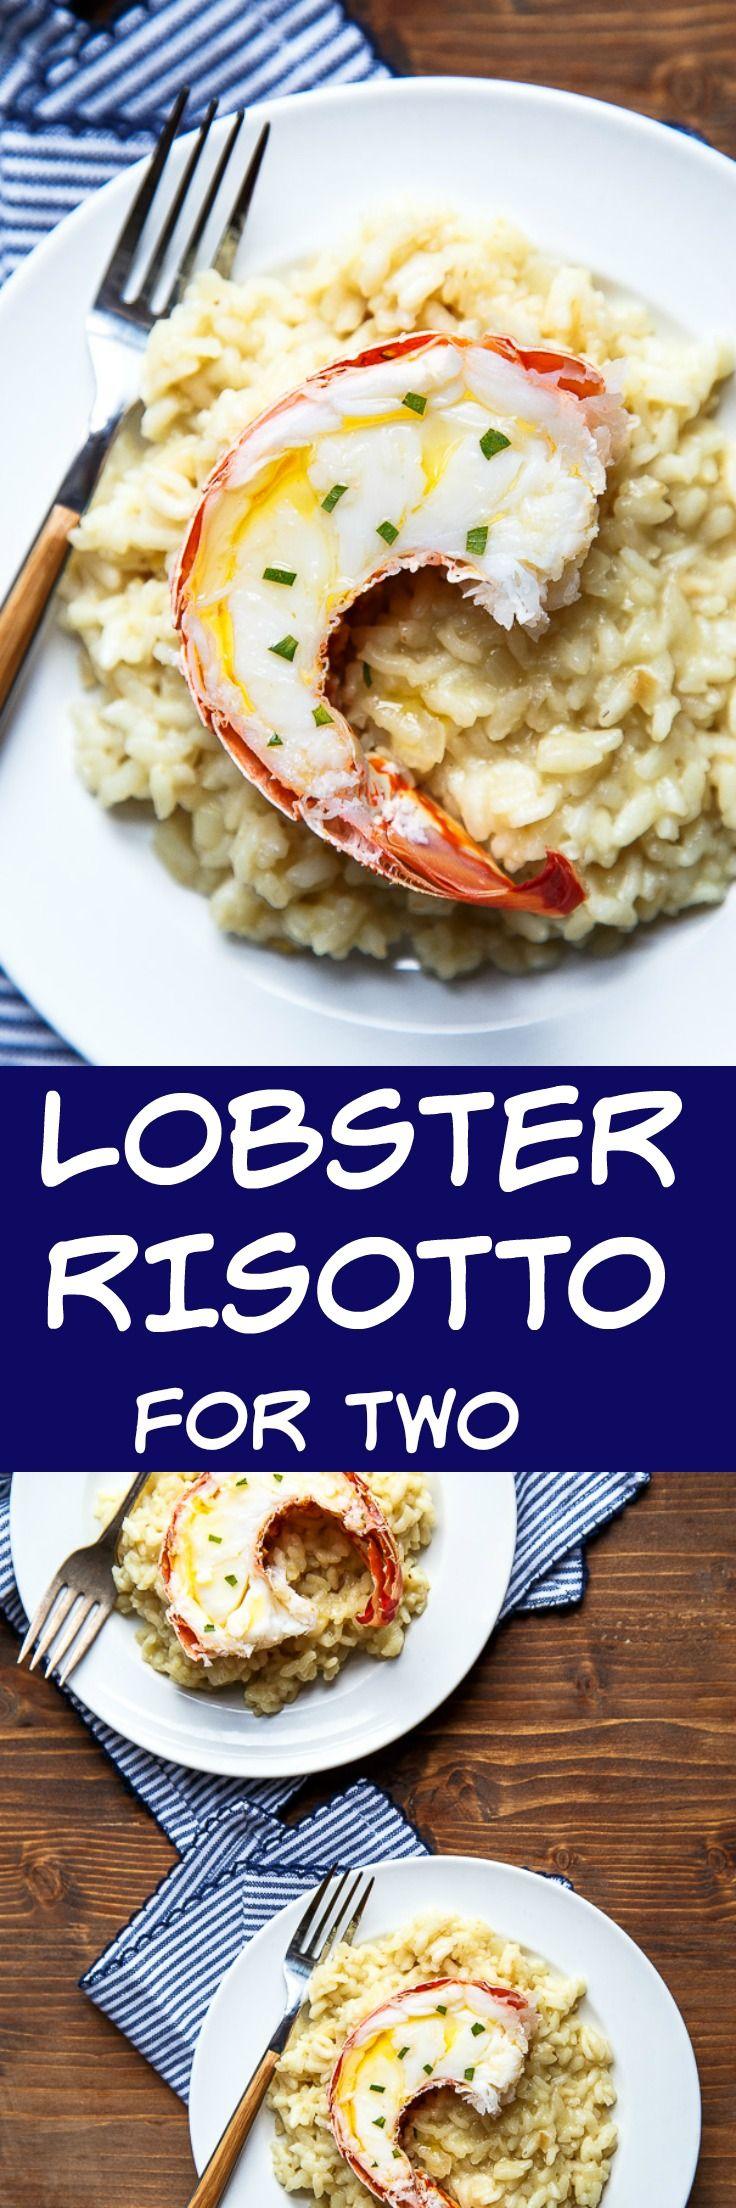 How To Make Lobster Risotto Recipe — Dishmaps